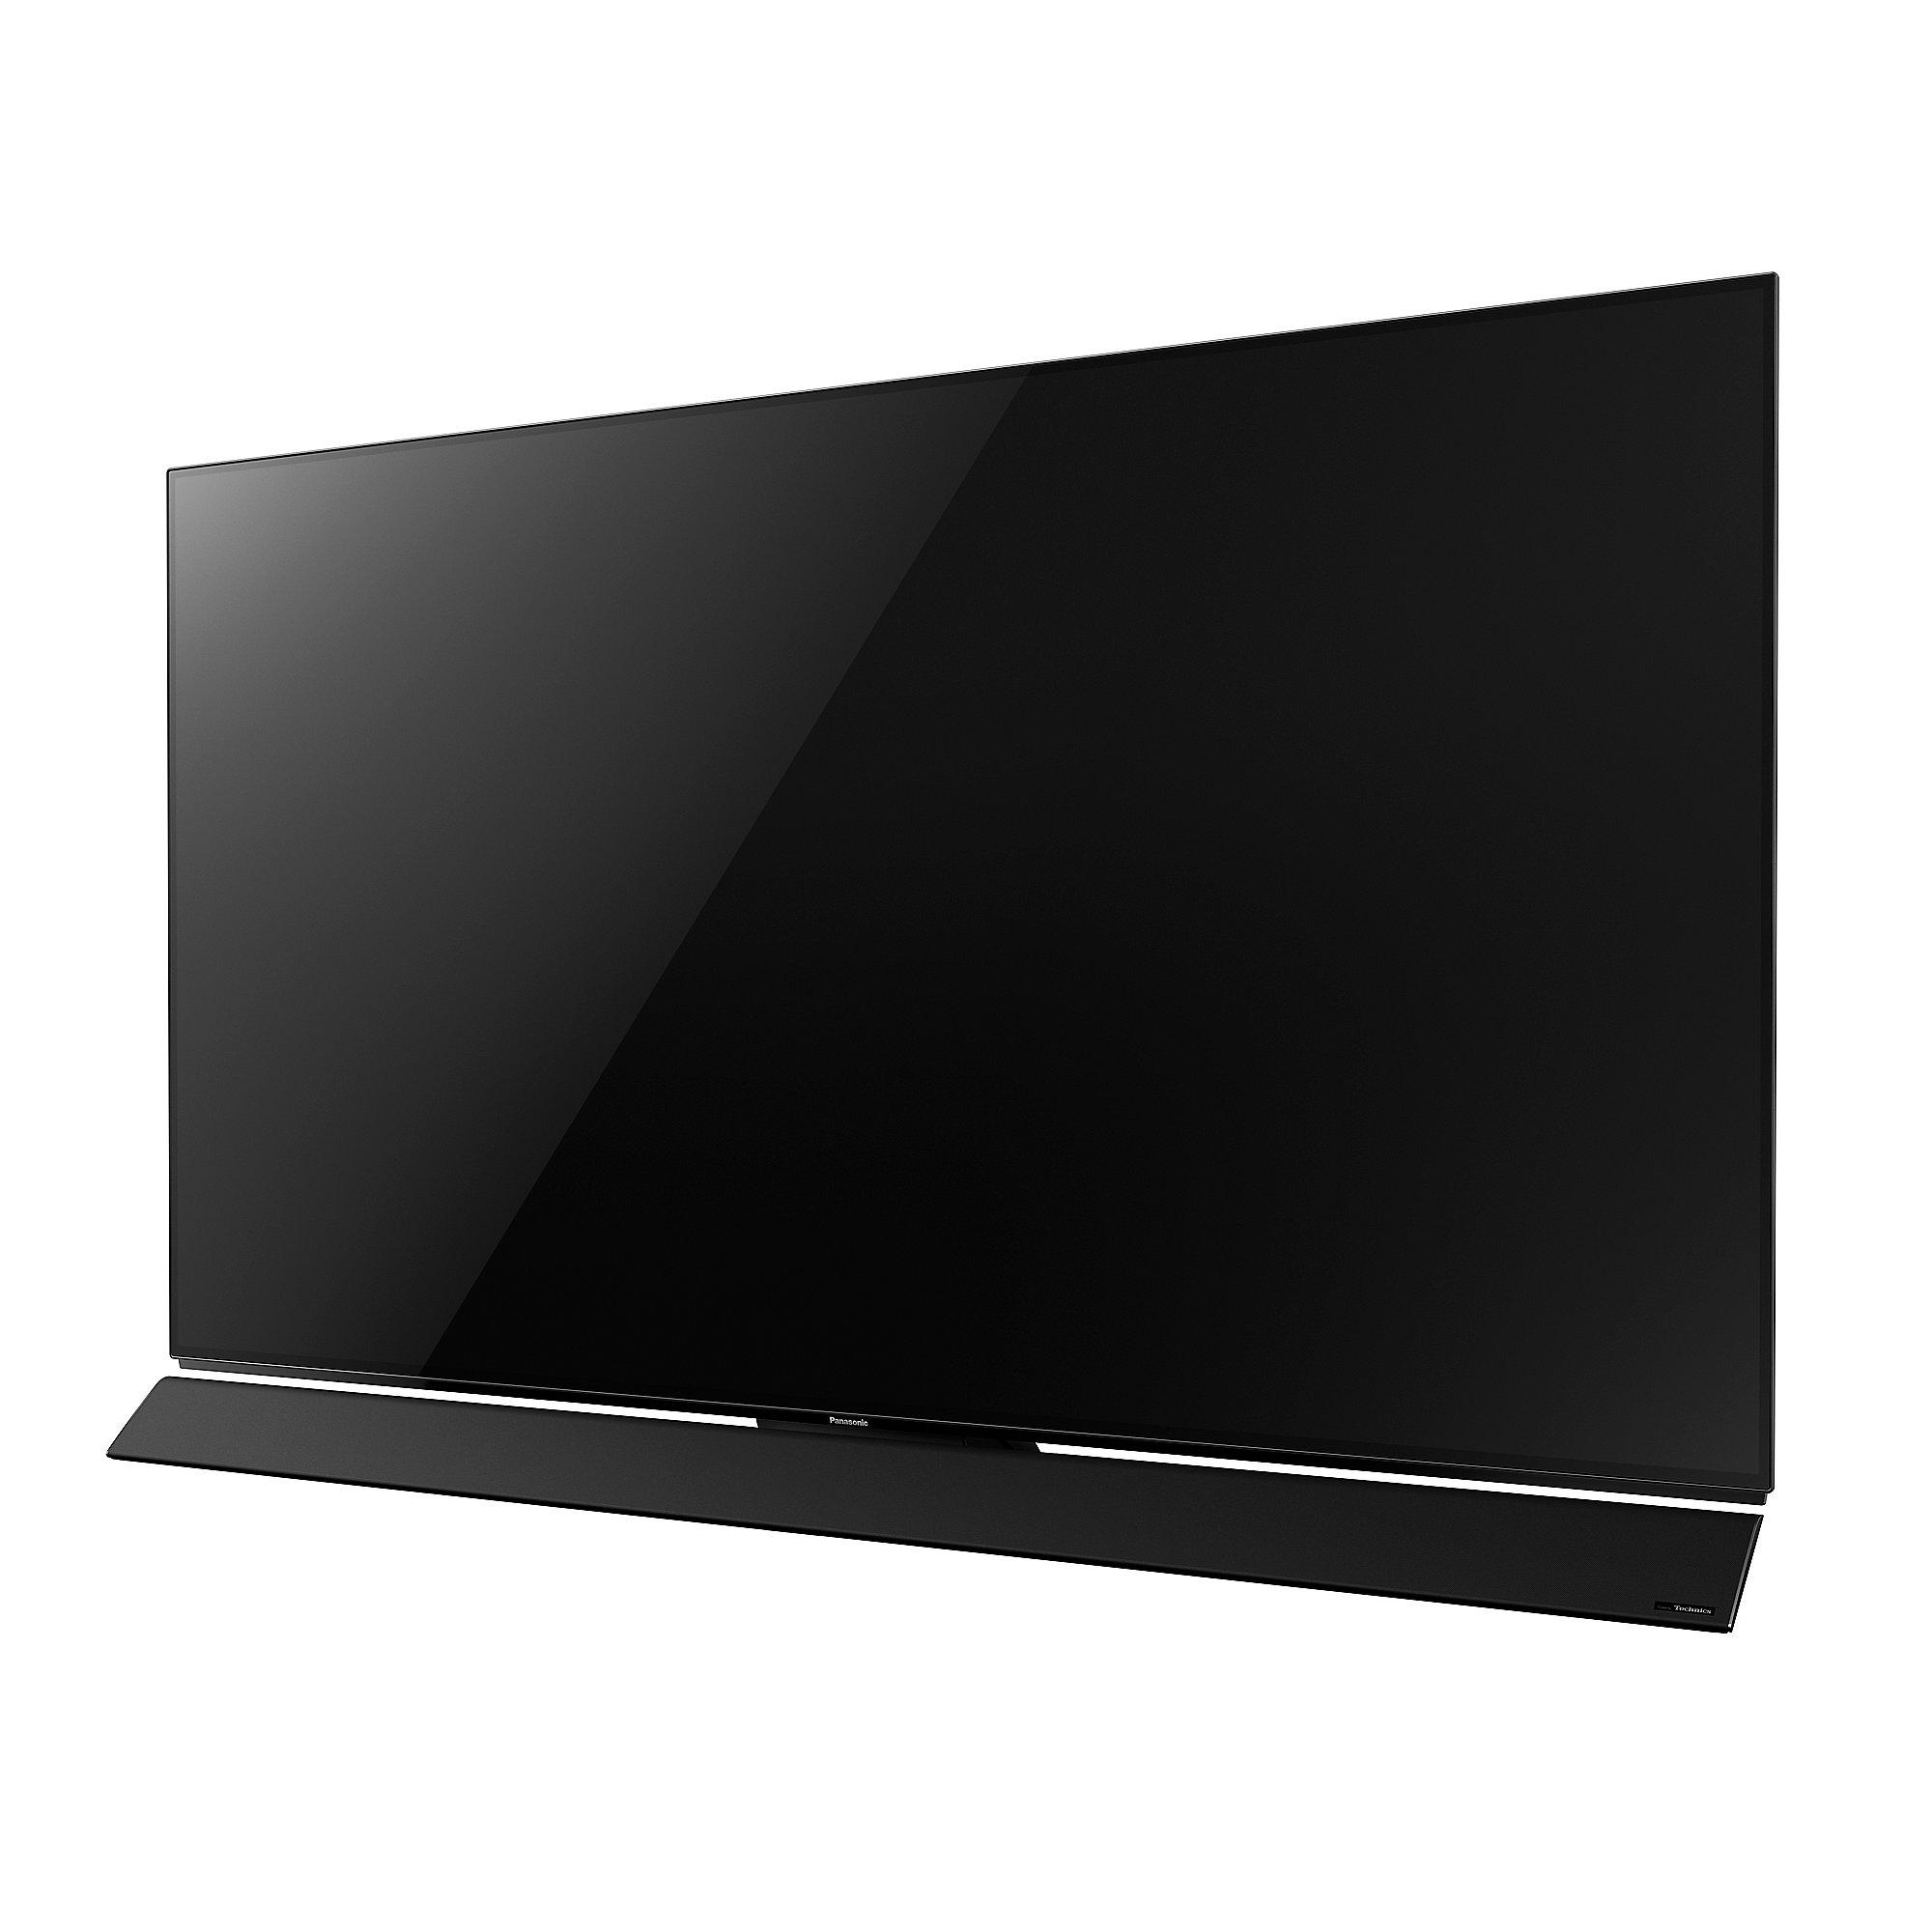 panasonic tx 65fzw954 oled 164cm 65 uhd smart fernseher. Black Bedroom Furniture Sets. Home Design Ideas